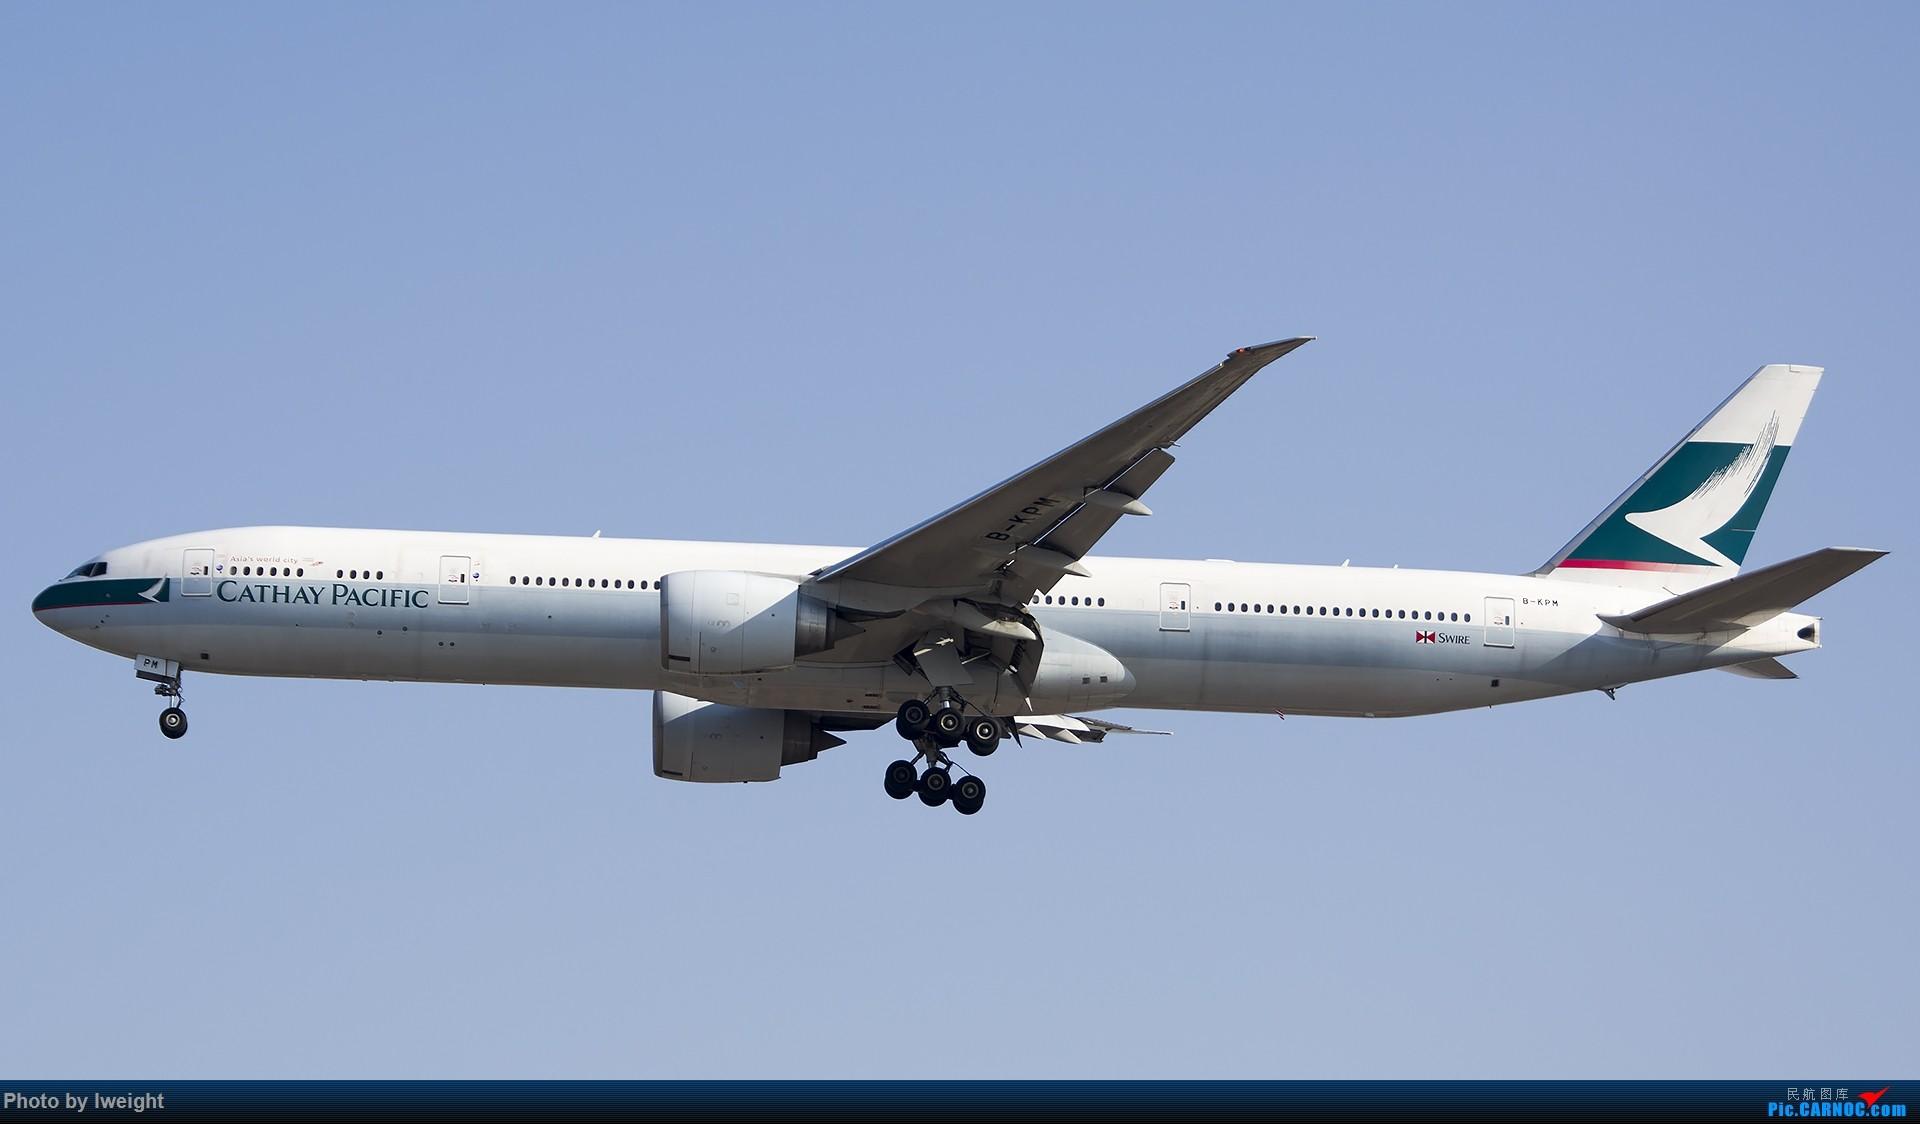 Re:[原创]2014-12-02 ZBAA随拍 BOEING 777-300ER B-KPM 中国北京首都国际机场